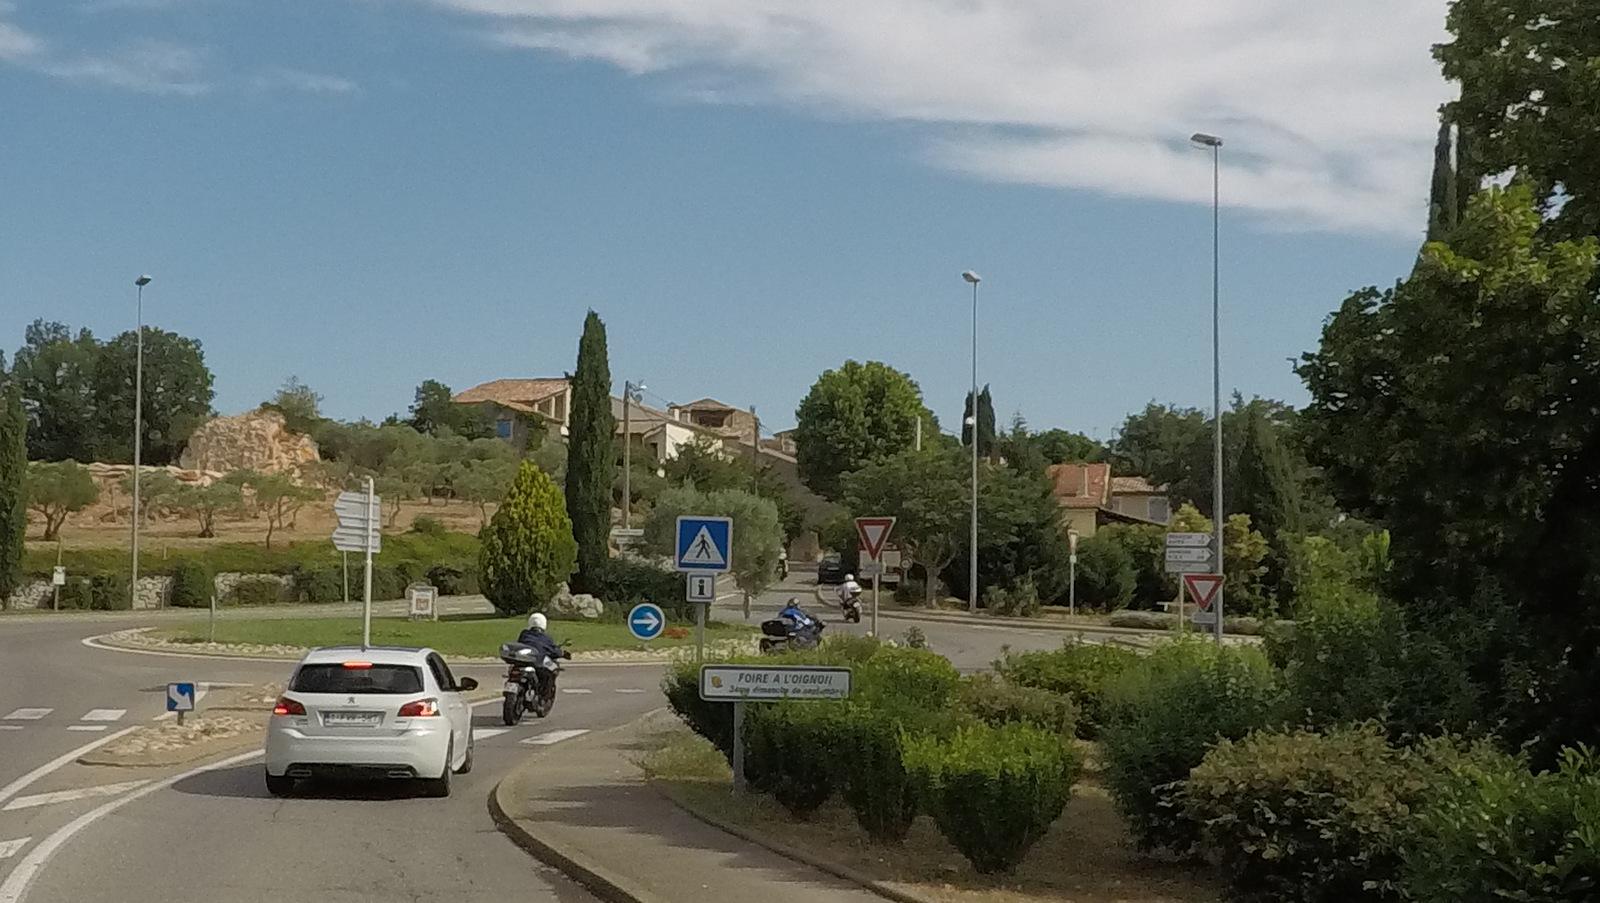 arrivée à Montmeyan